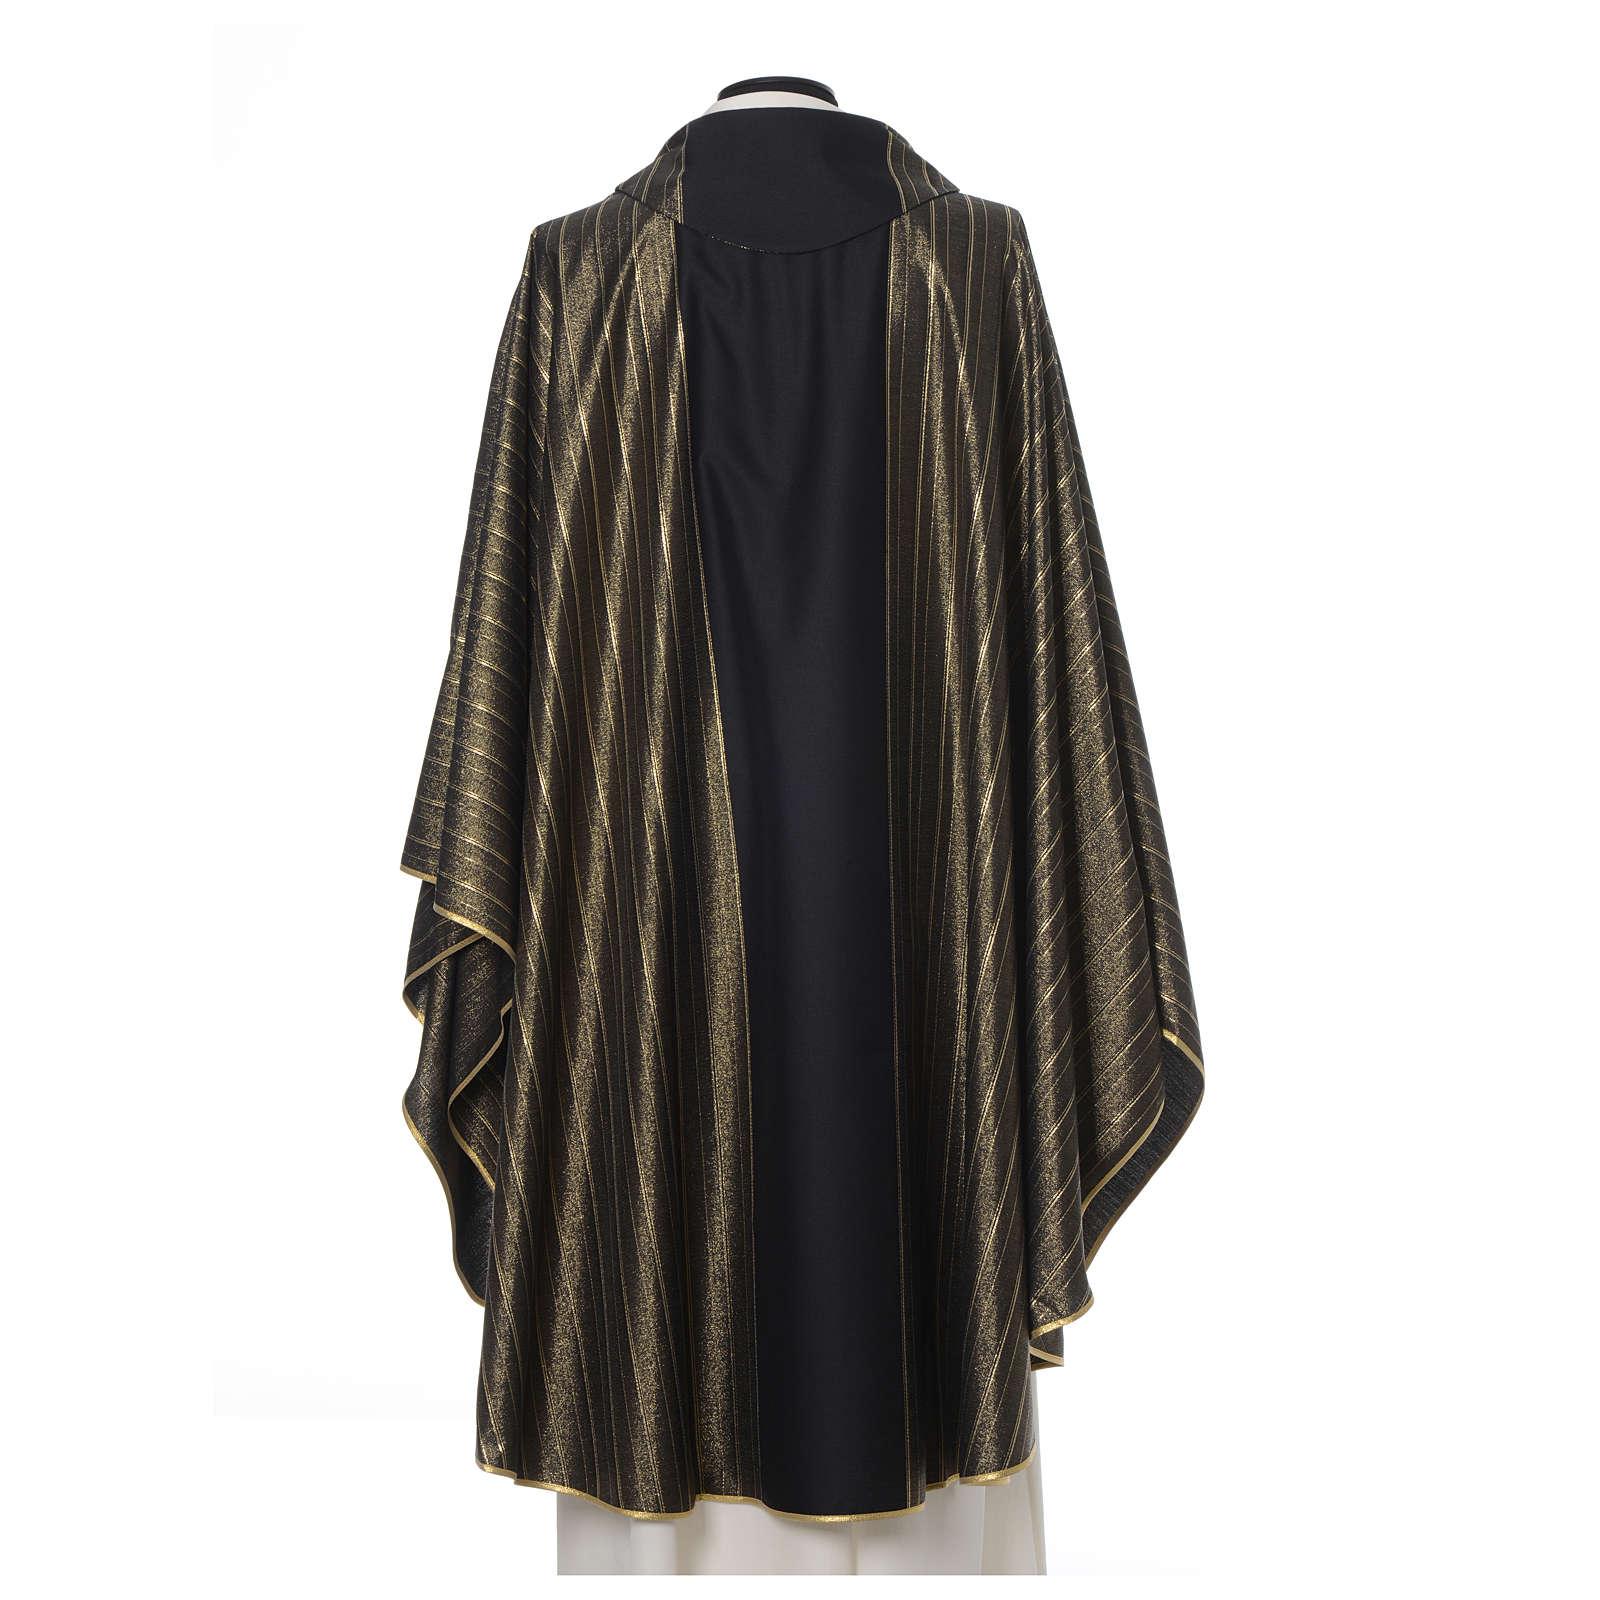 Casula nera pura lana vergine doppio ritorto Tasmania 4